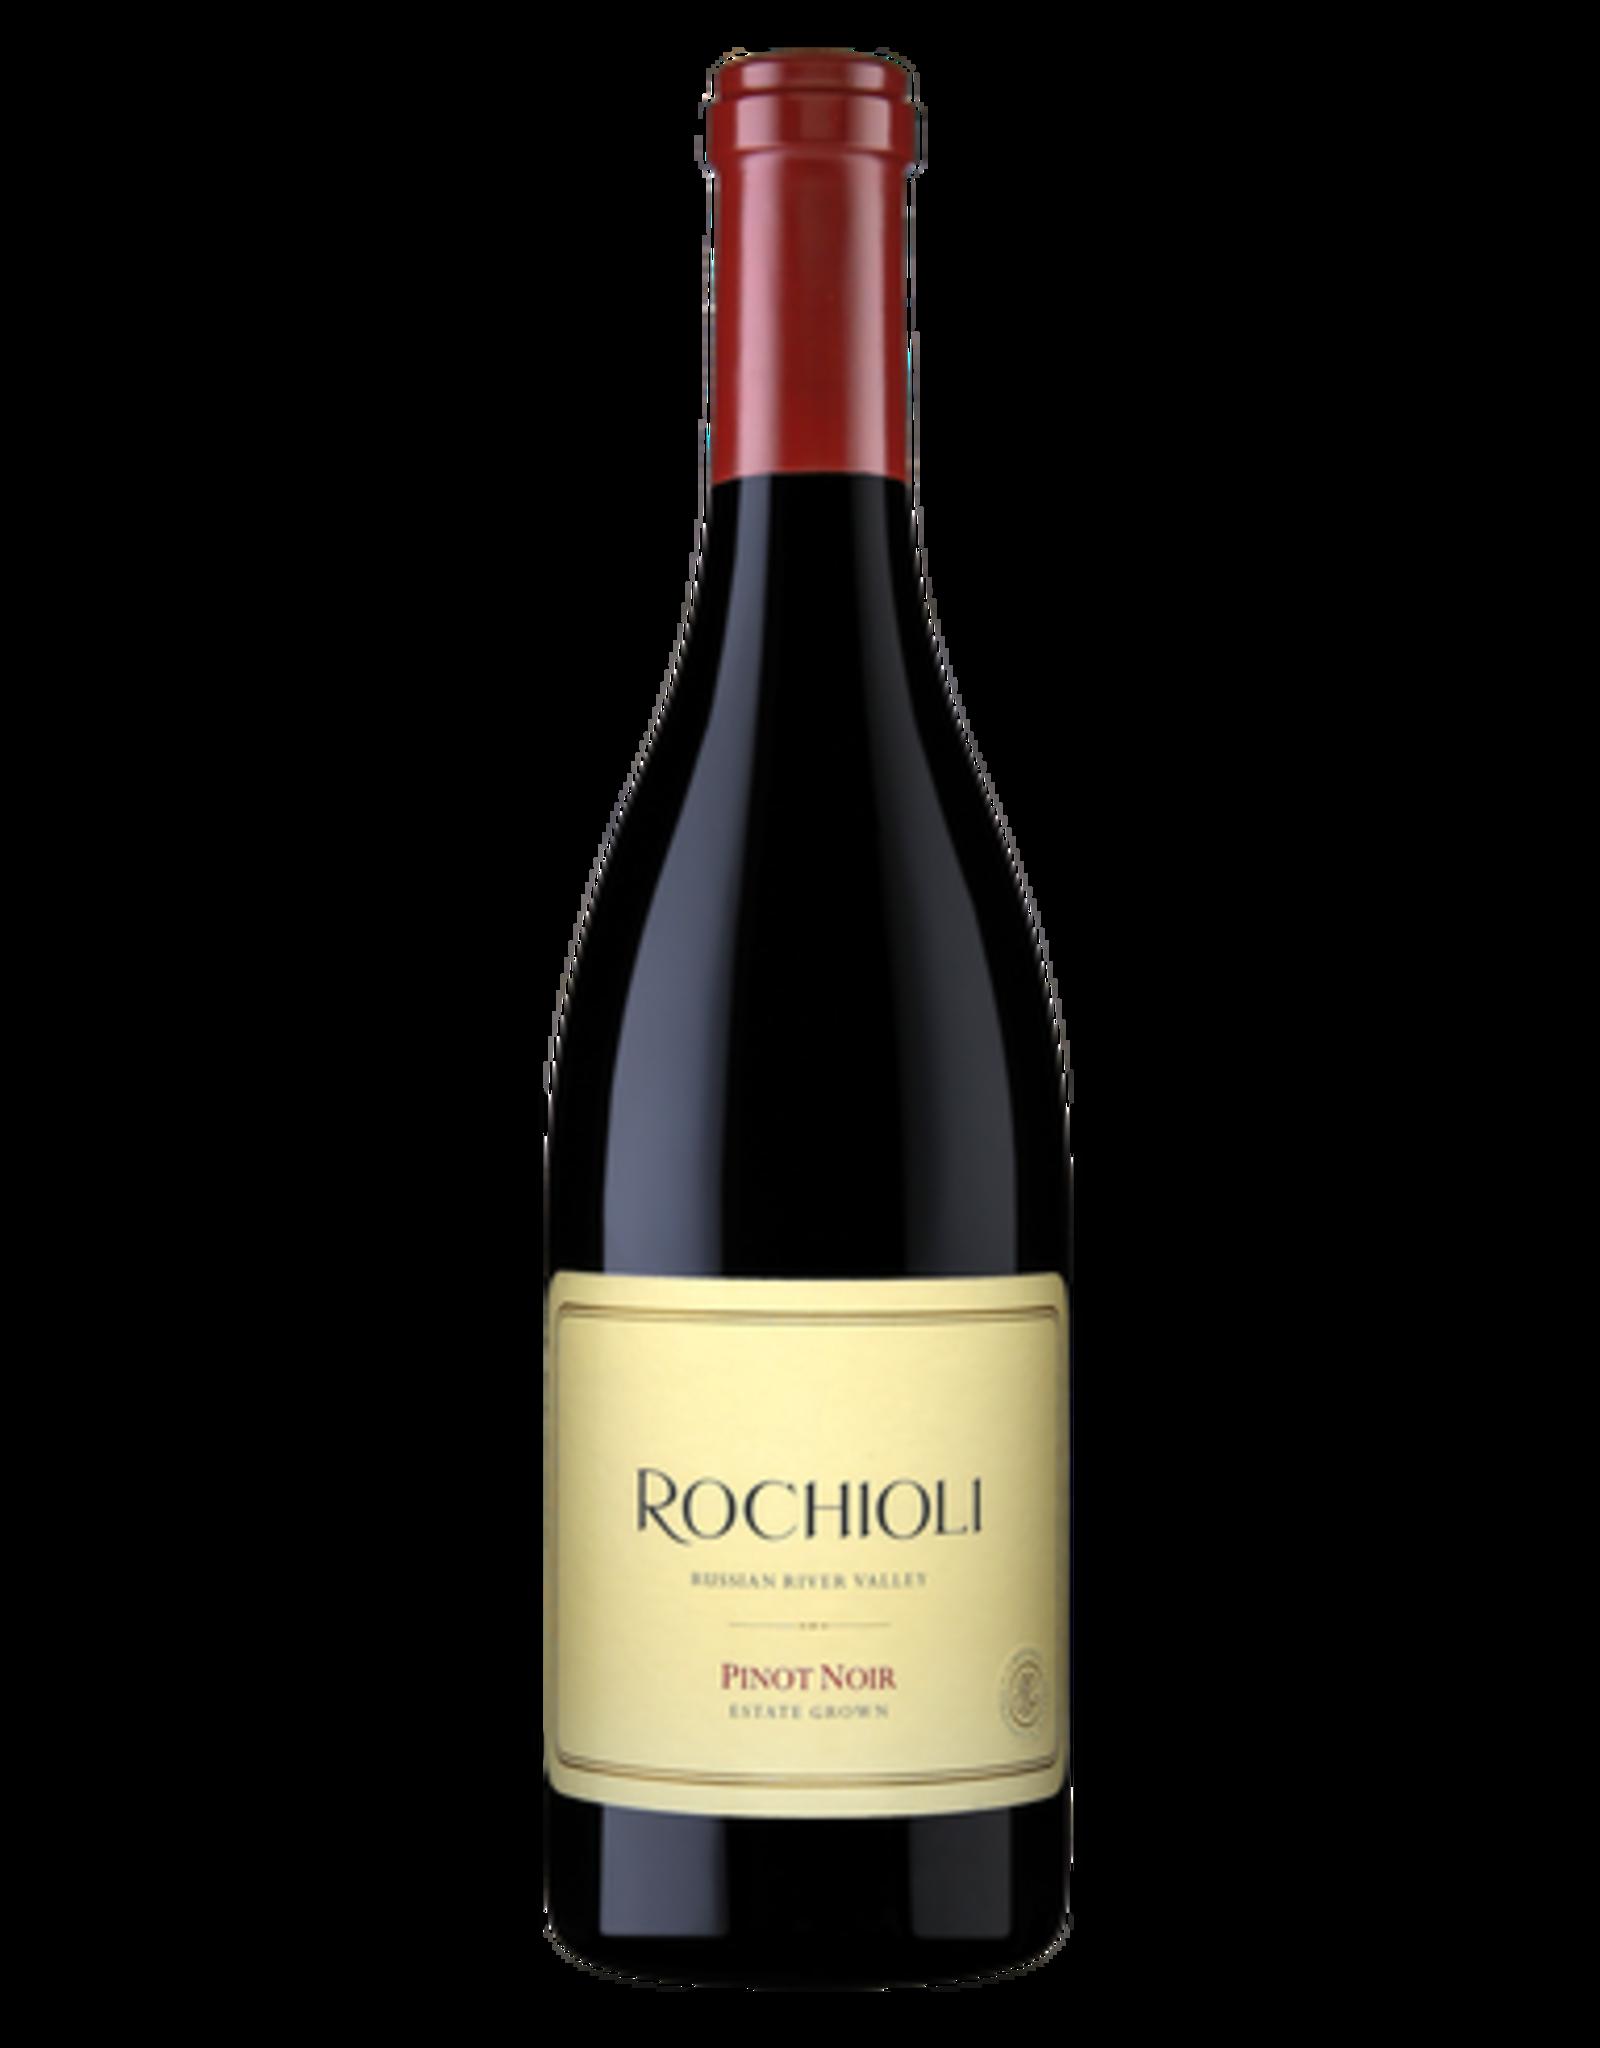 Rochioli Pinot Noir